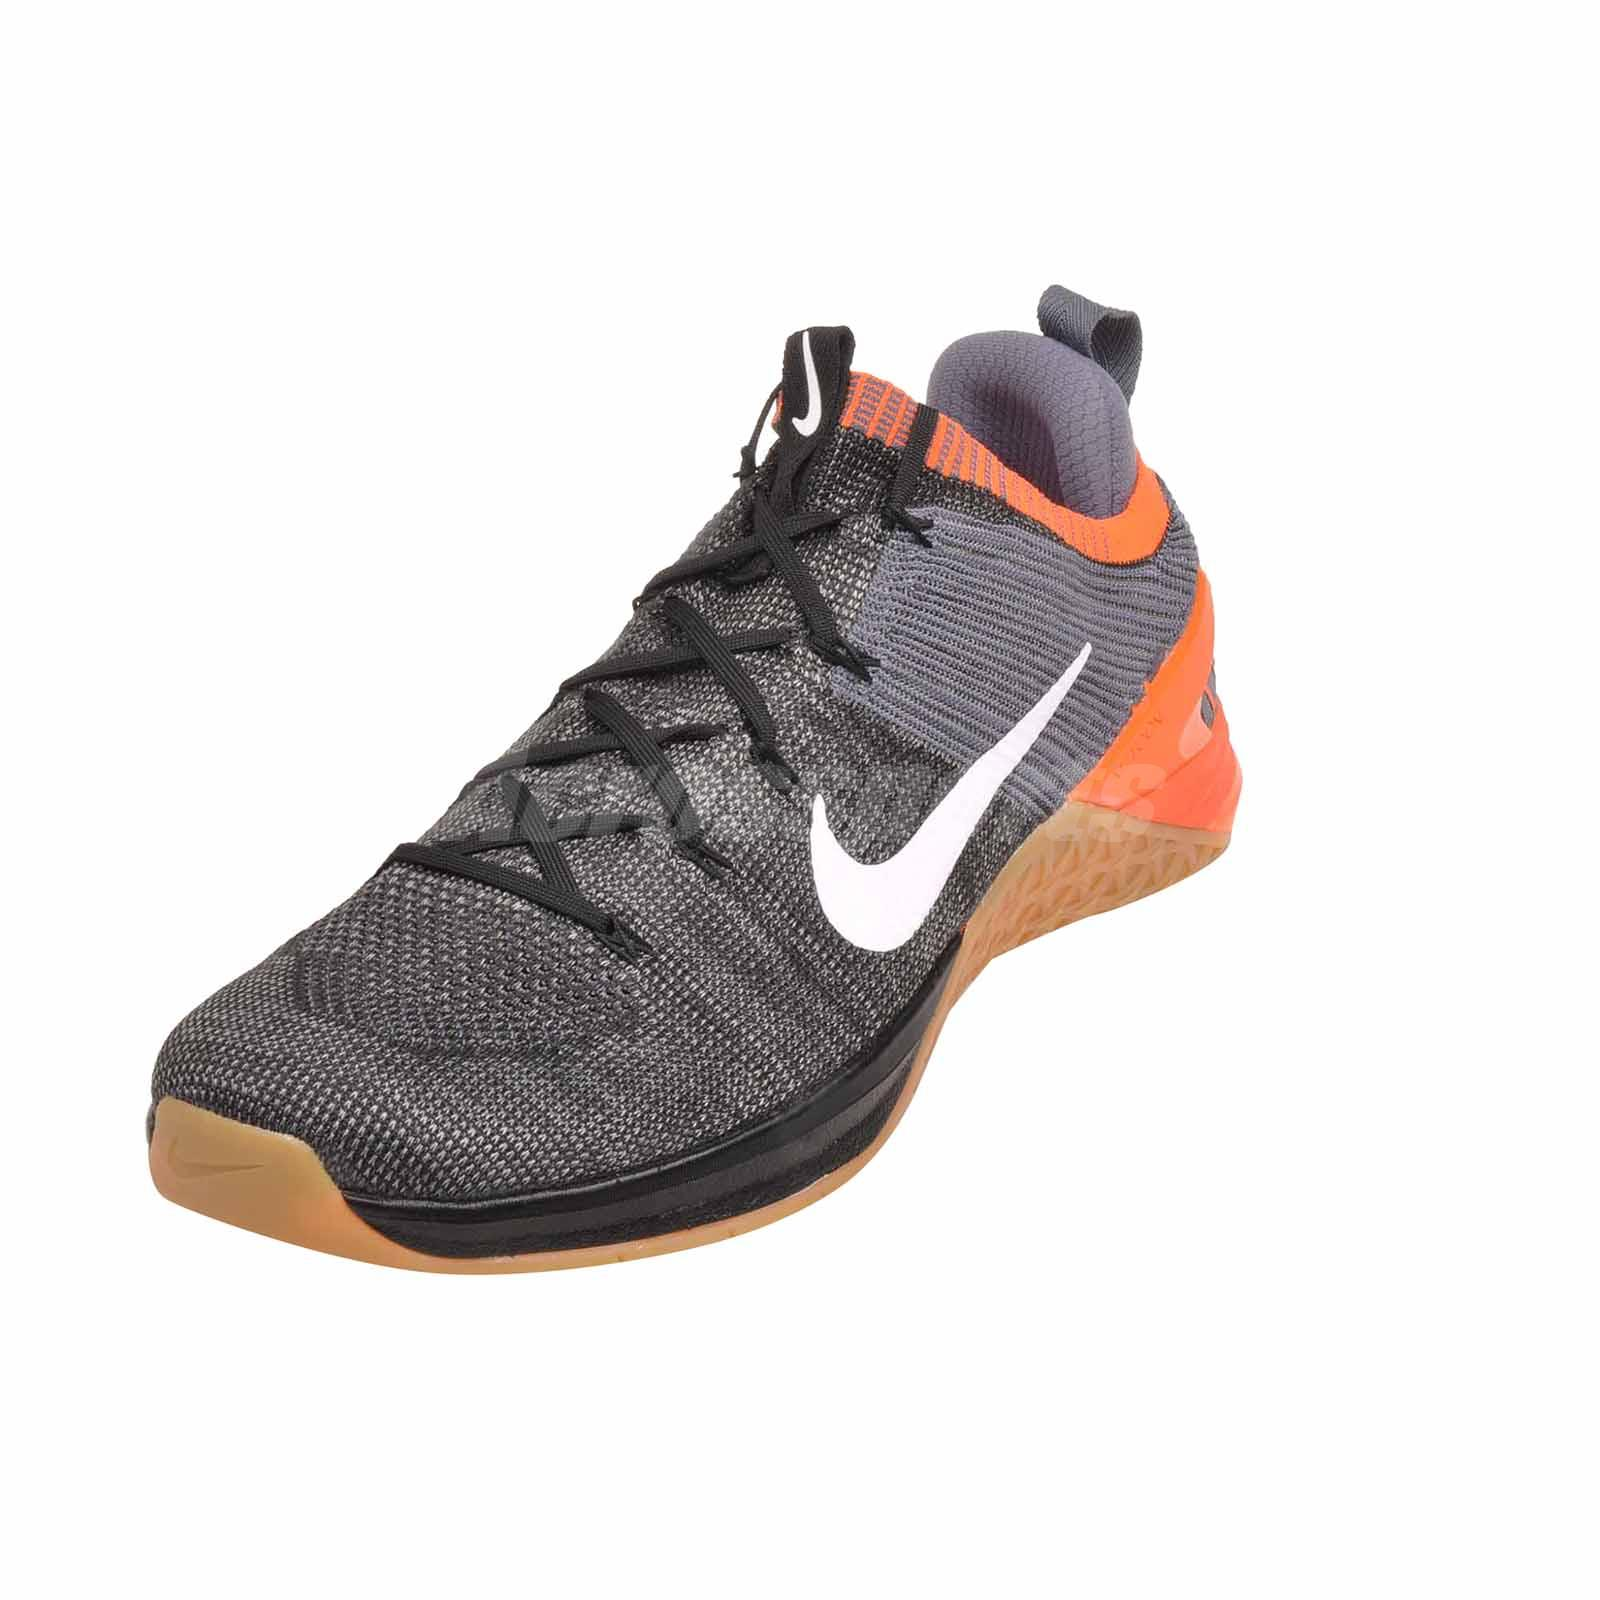 352bf200dc75 Nike Metcon DSX Flyknit 2 Cross Training Mens Shoes Black NWOB ...